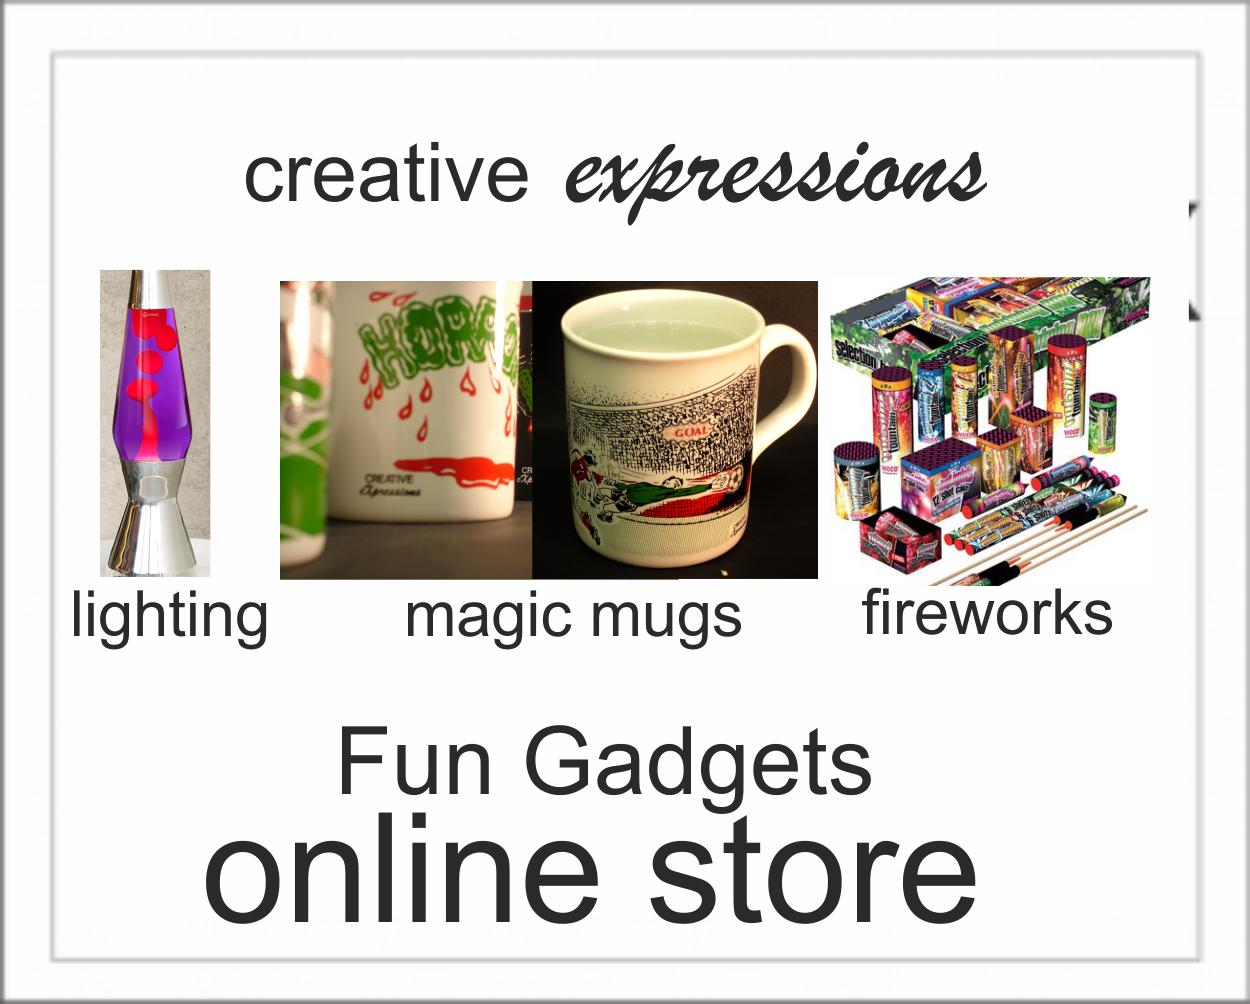 Fun Gadgets fix Fireworks, Magic mugs Lightin